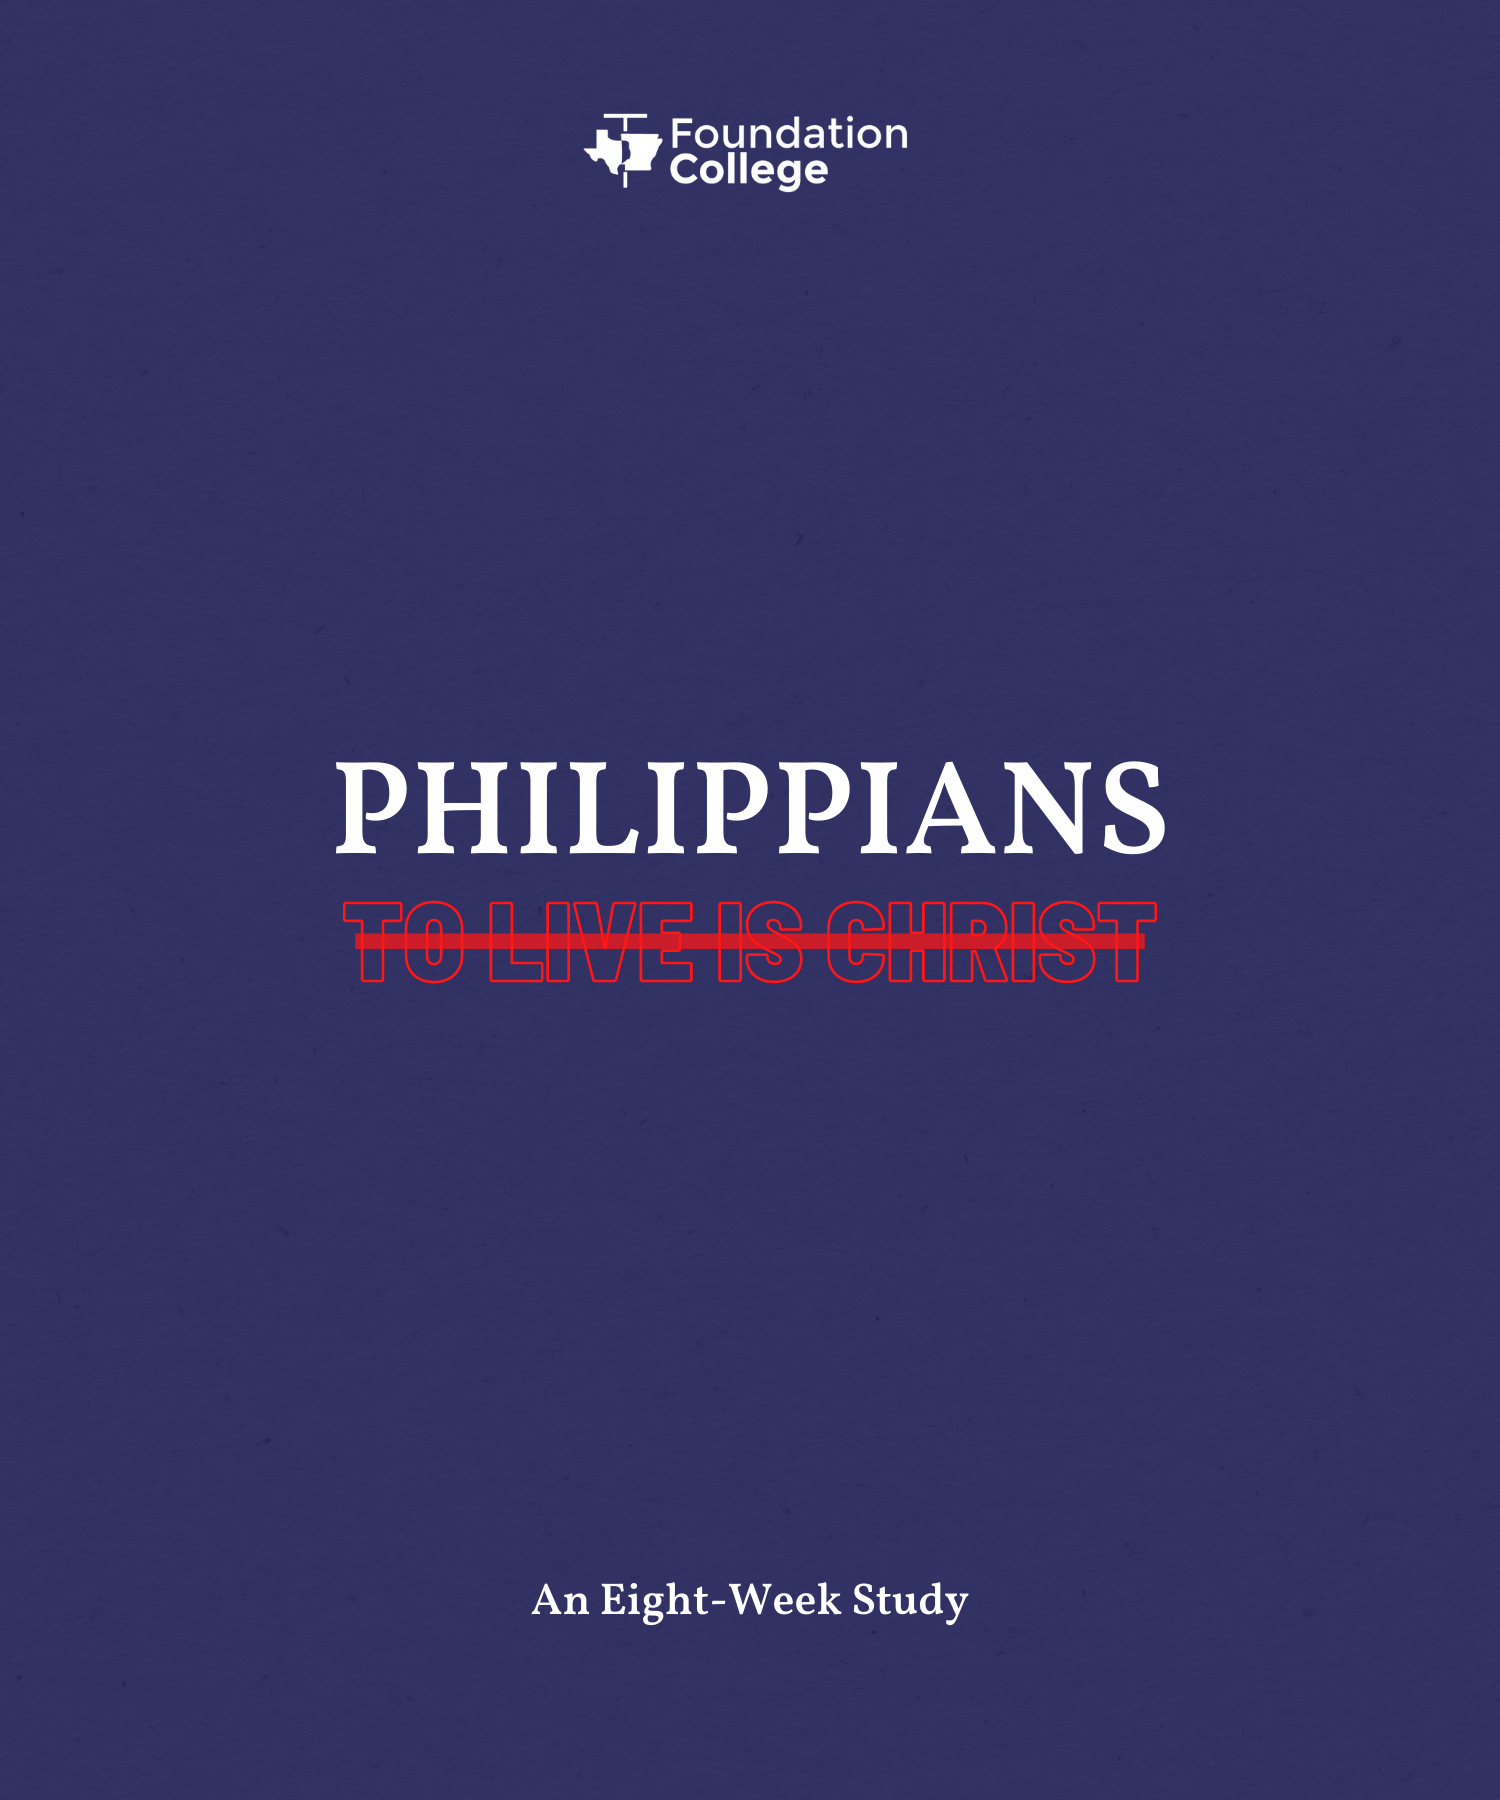 philippians-website-1608063207.png